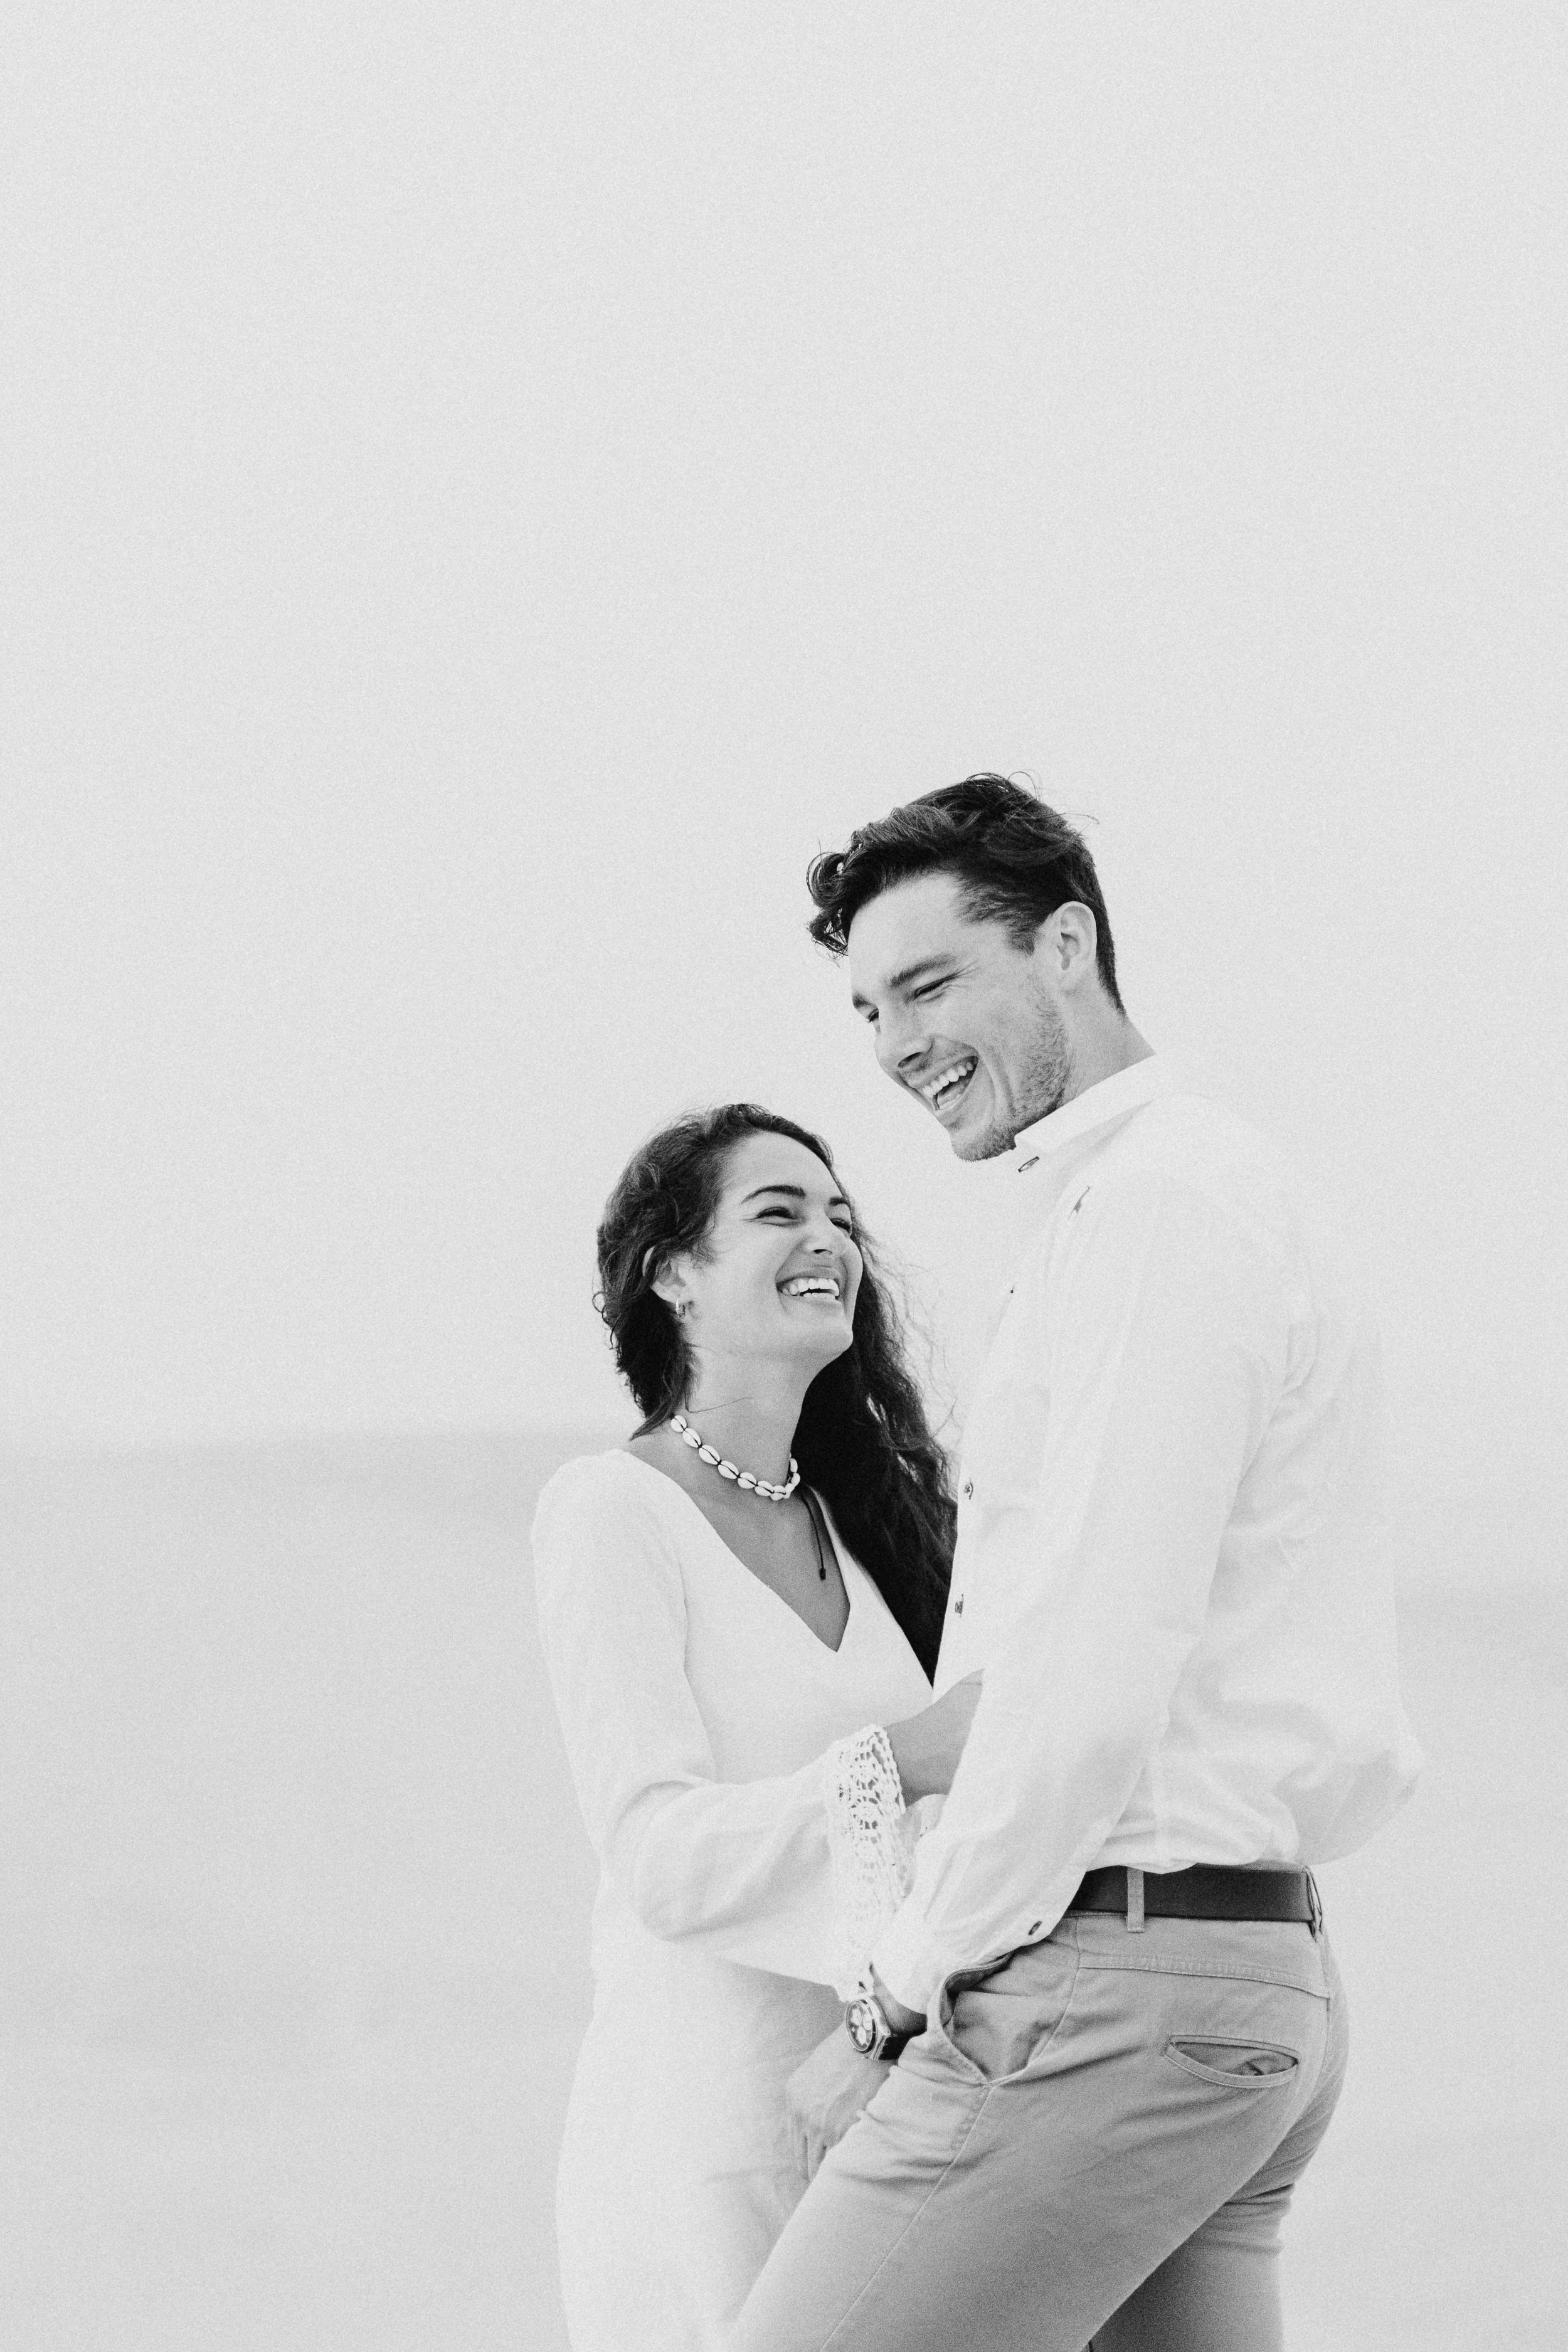 huacachina-peru-honeymoon-elopement-destination-wedding-photography-michael-cozzens-7.jpg